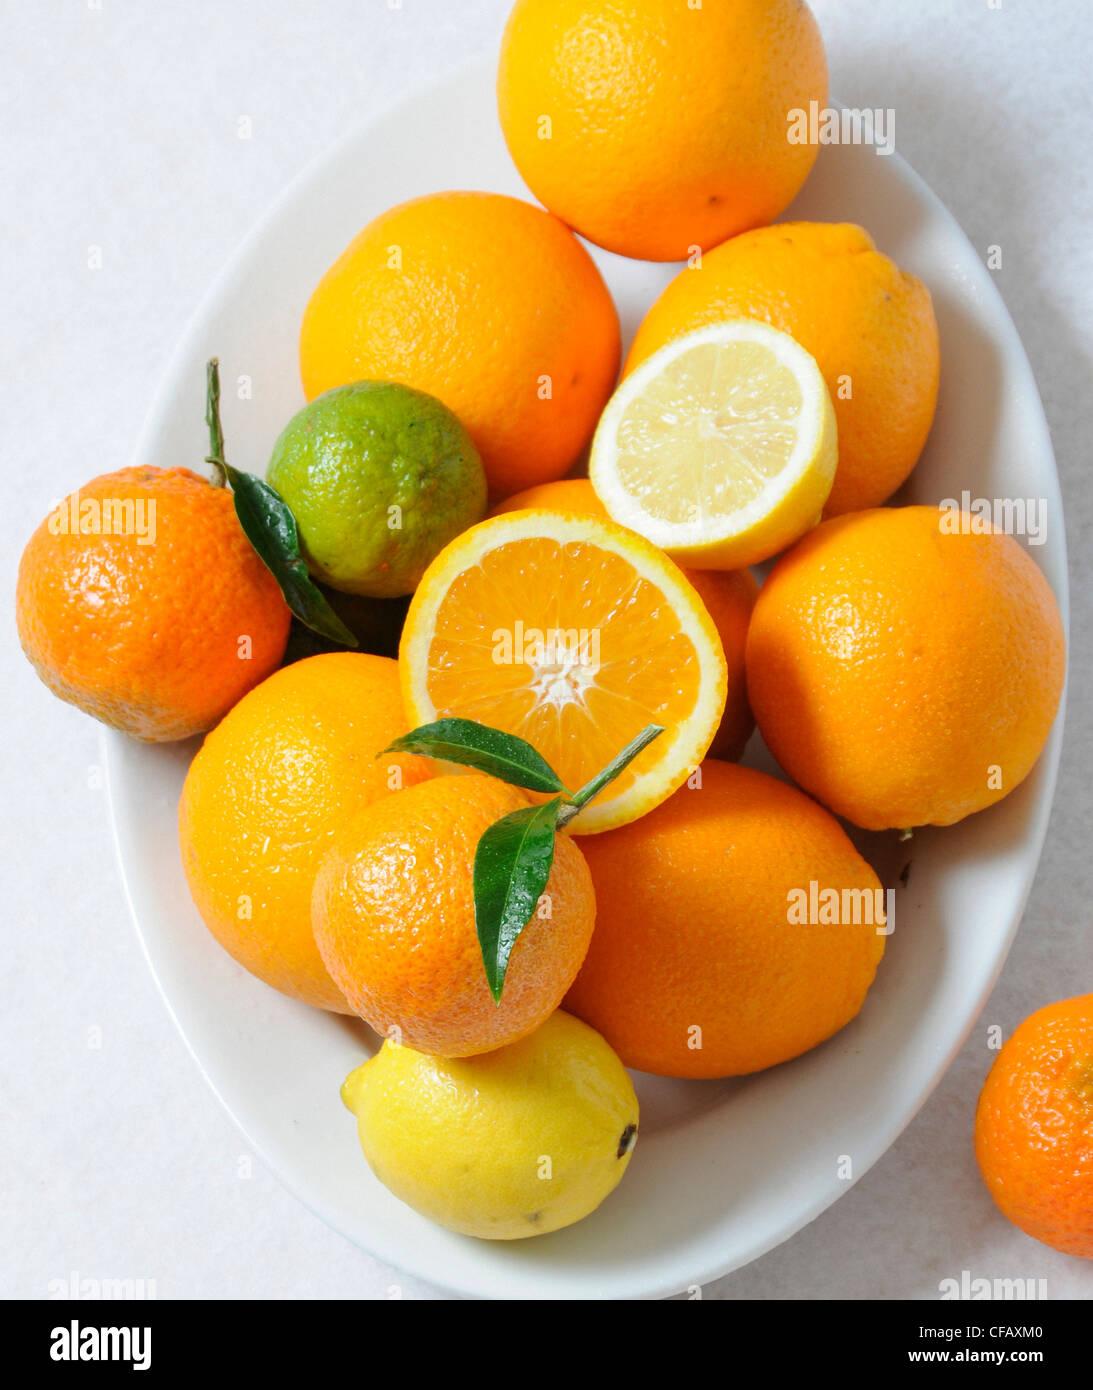 Vitamins, vitamin C, oranges, lemon, fruits Citrus fruit, food, eating, - Stock Image